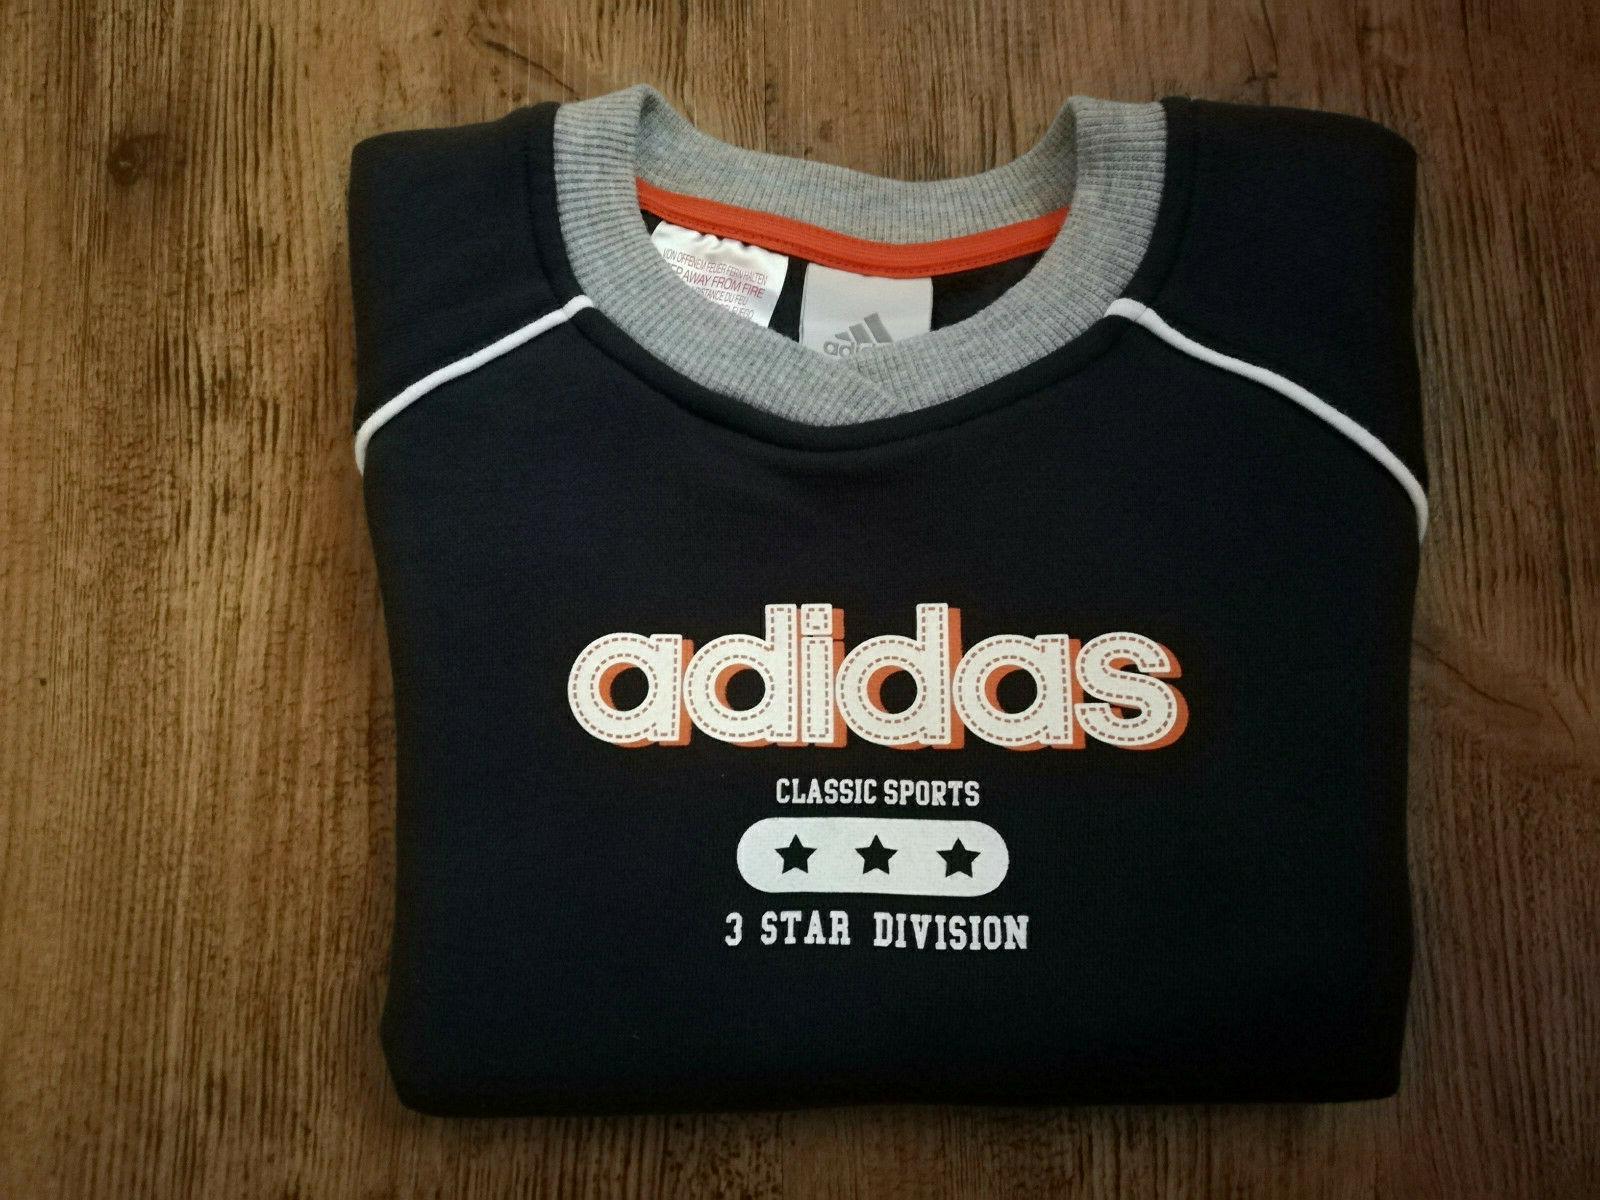 Neu Dunkelblau Pulli Pullover Sport Sweatshirt Sweater Adidas Jungen UVqpSzM